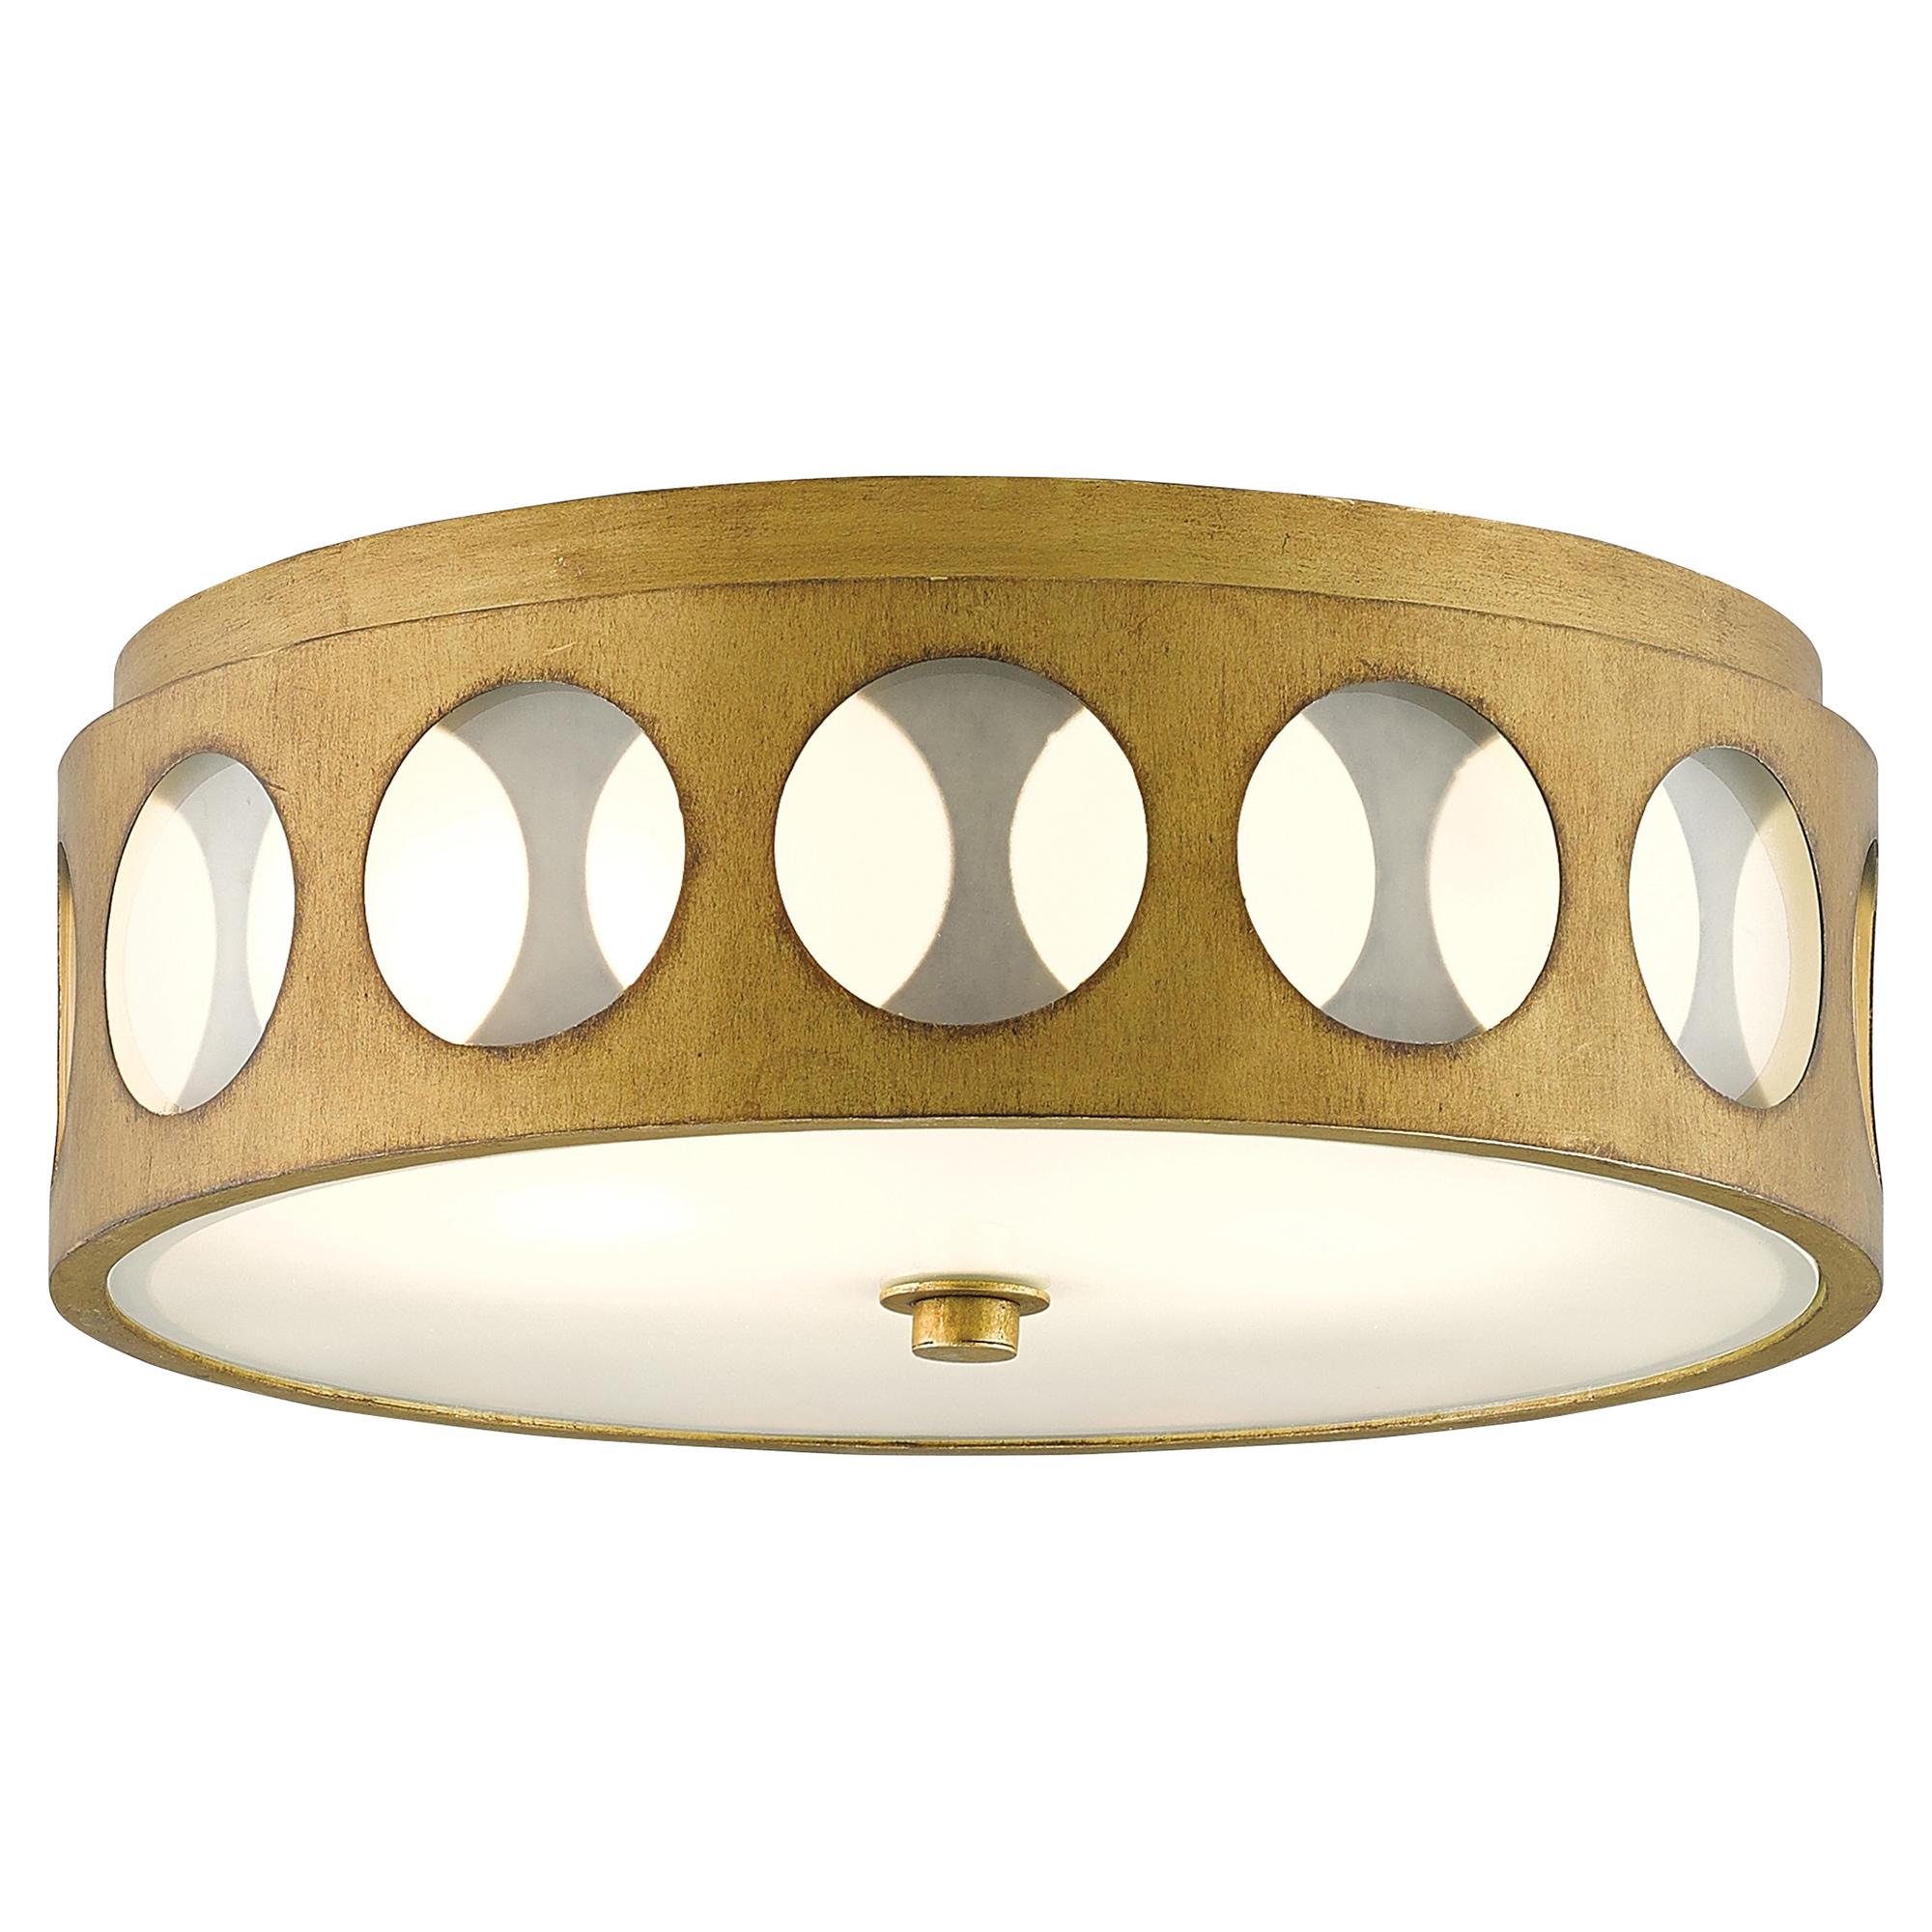 Embry Retro Modern Glass Dot Brass Ceiling Mount